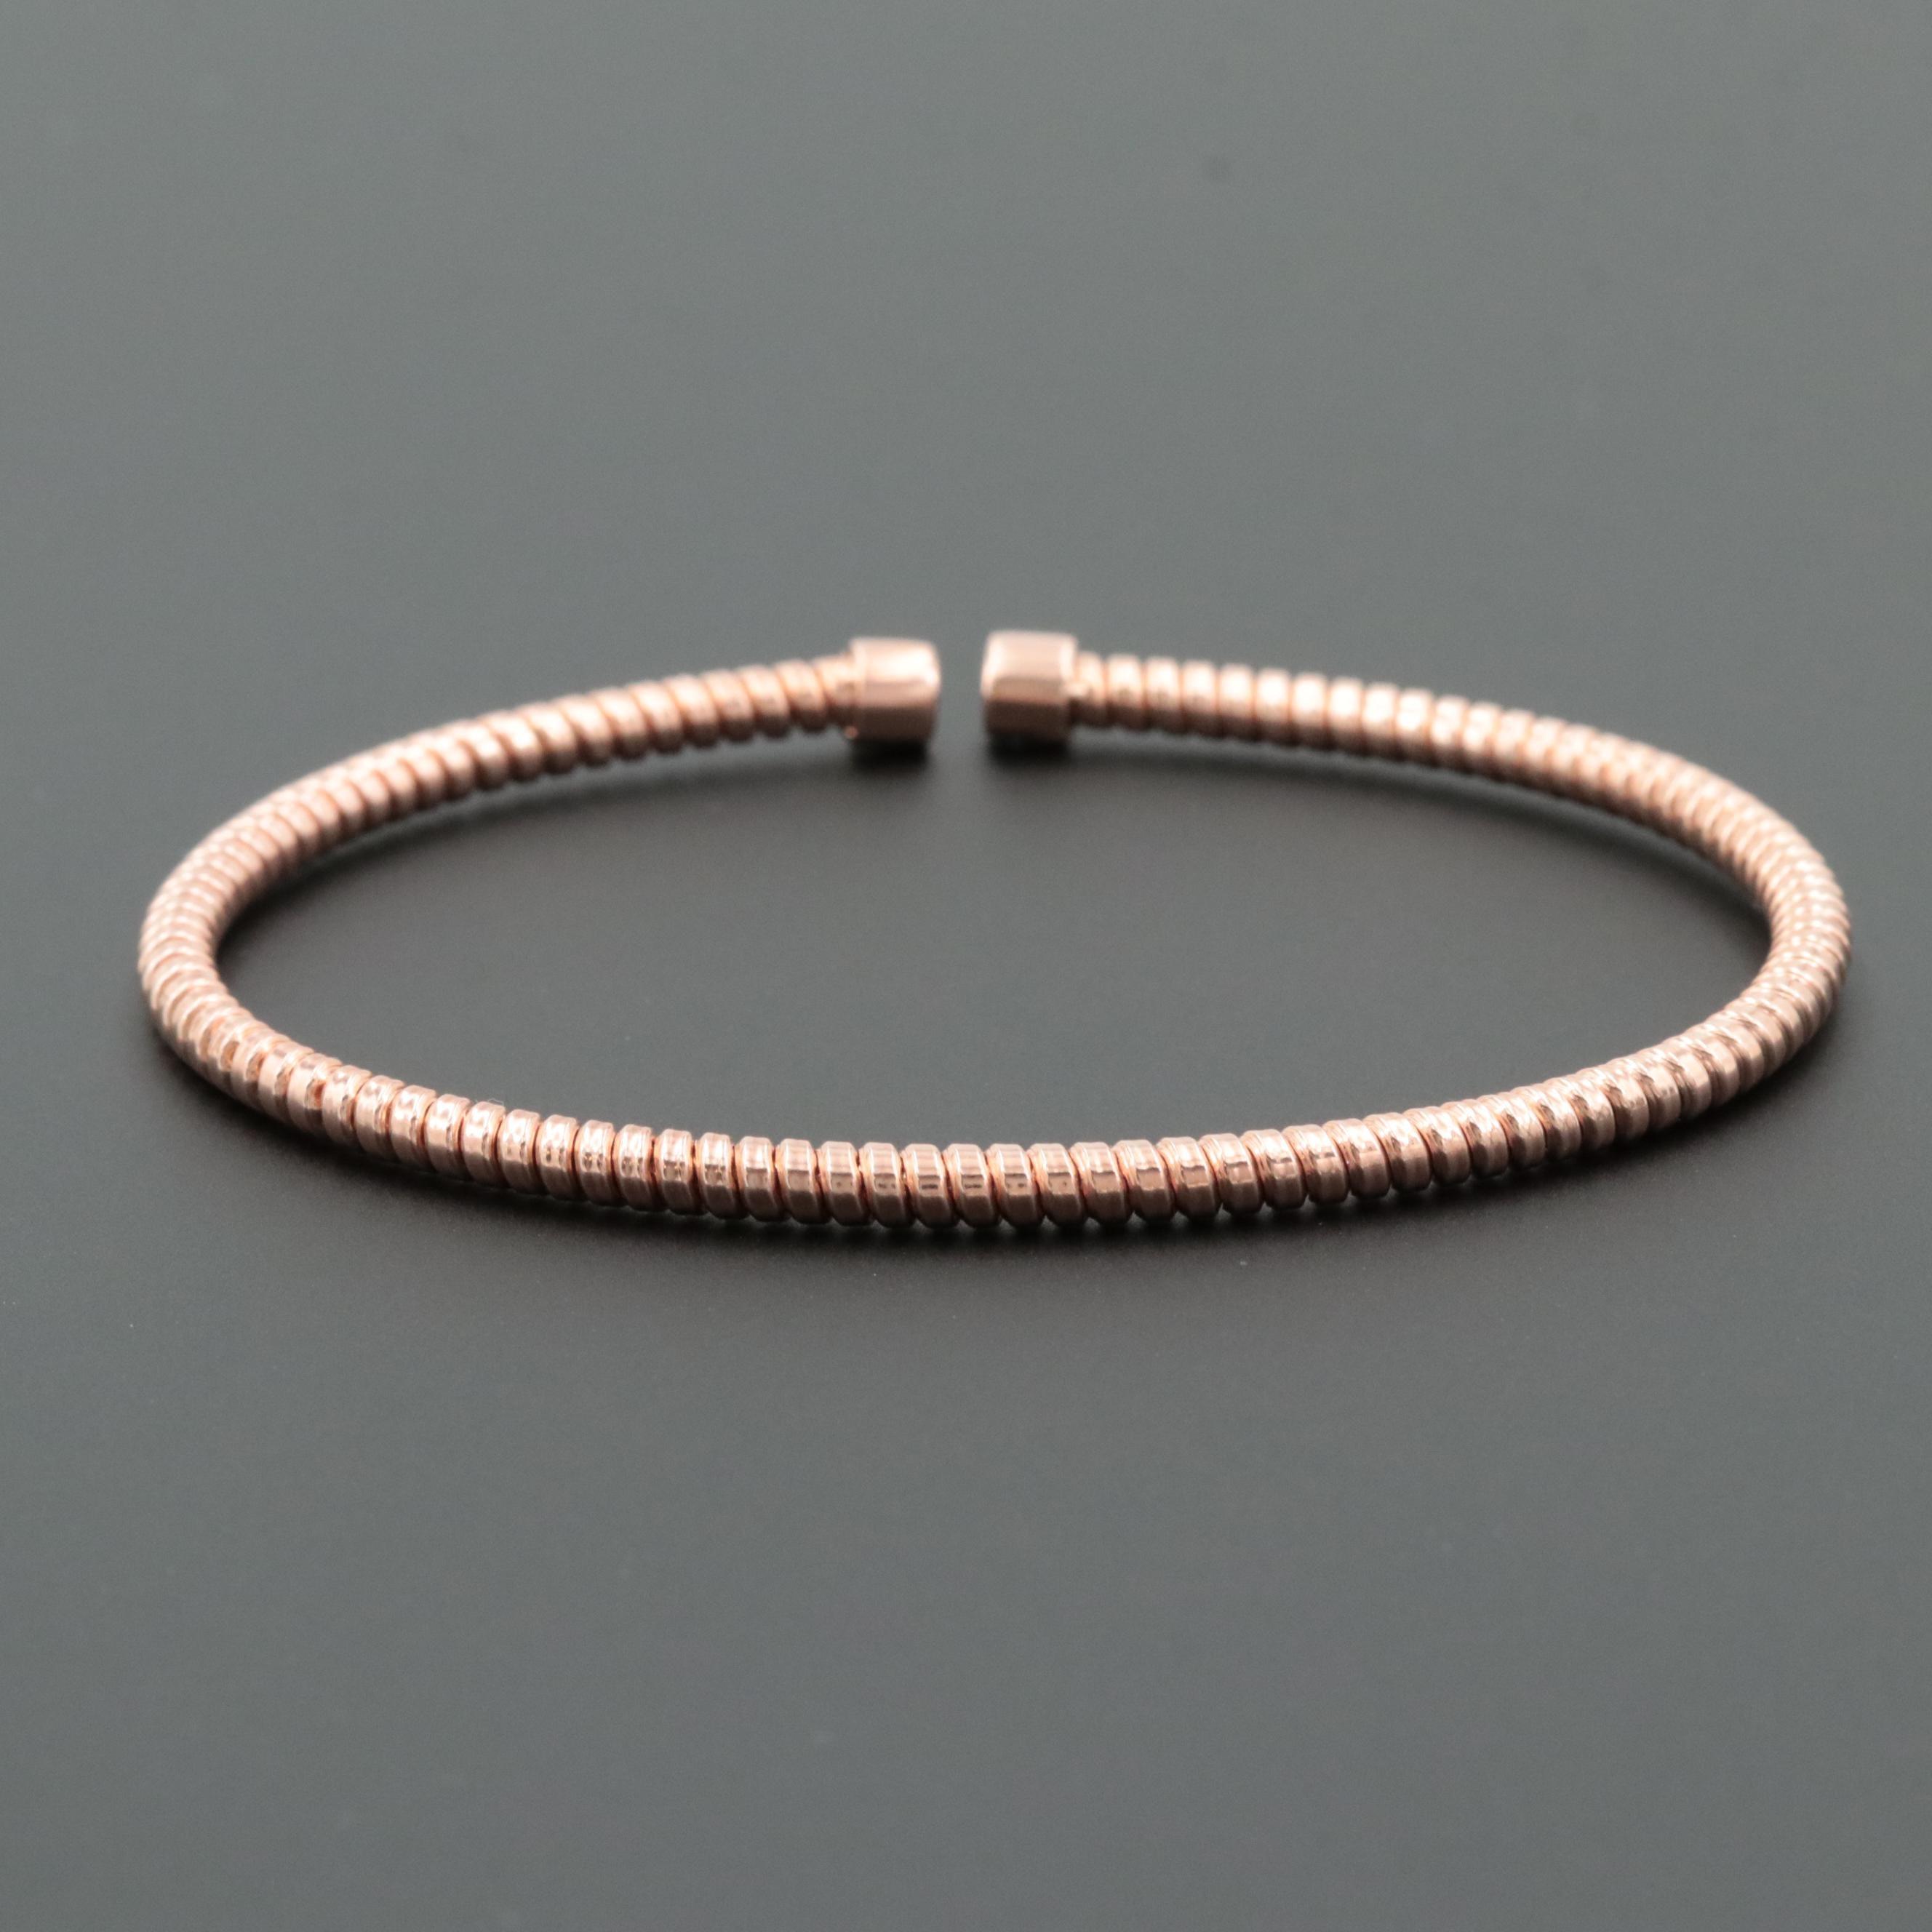 Rose Gold on Sterling Silver Cuff Bracelet